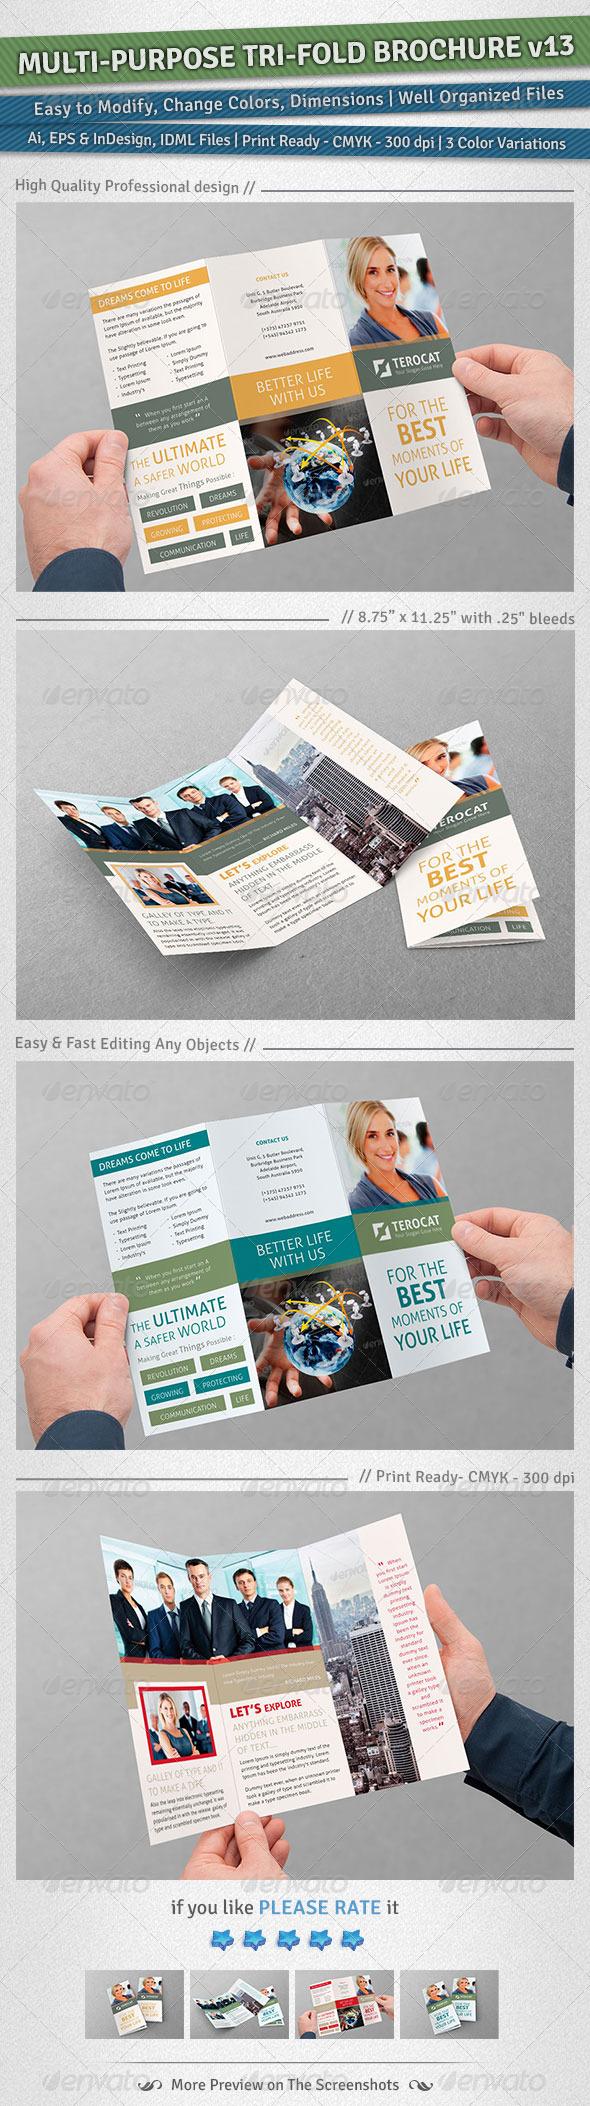 Multi-purpose Tri-Fold Brochure Volume 13